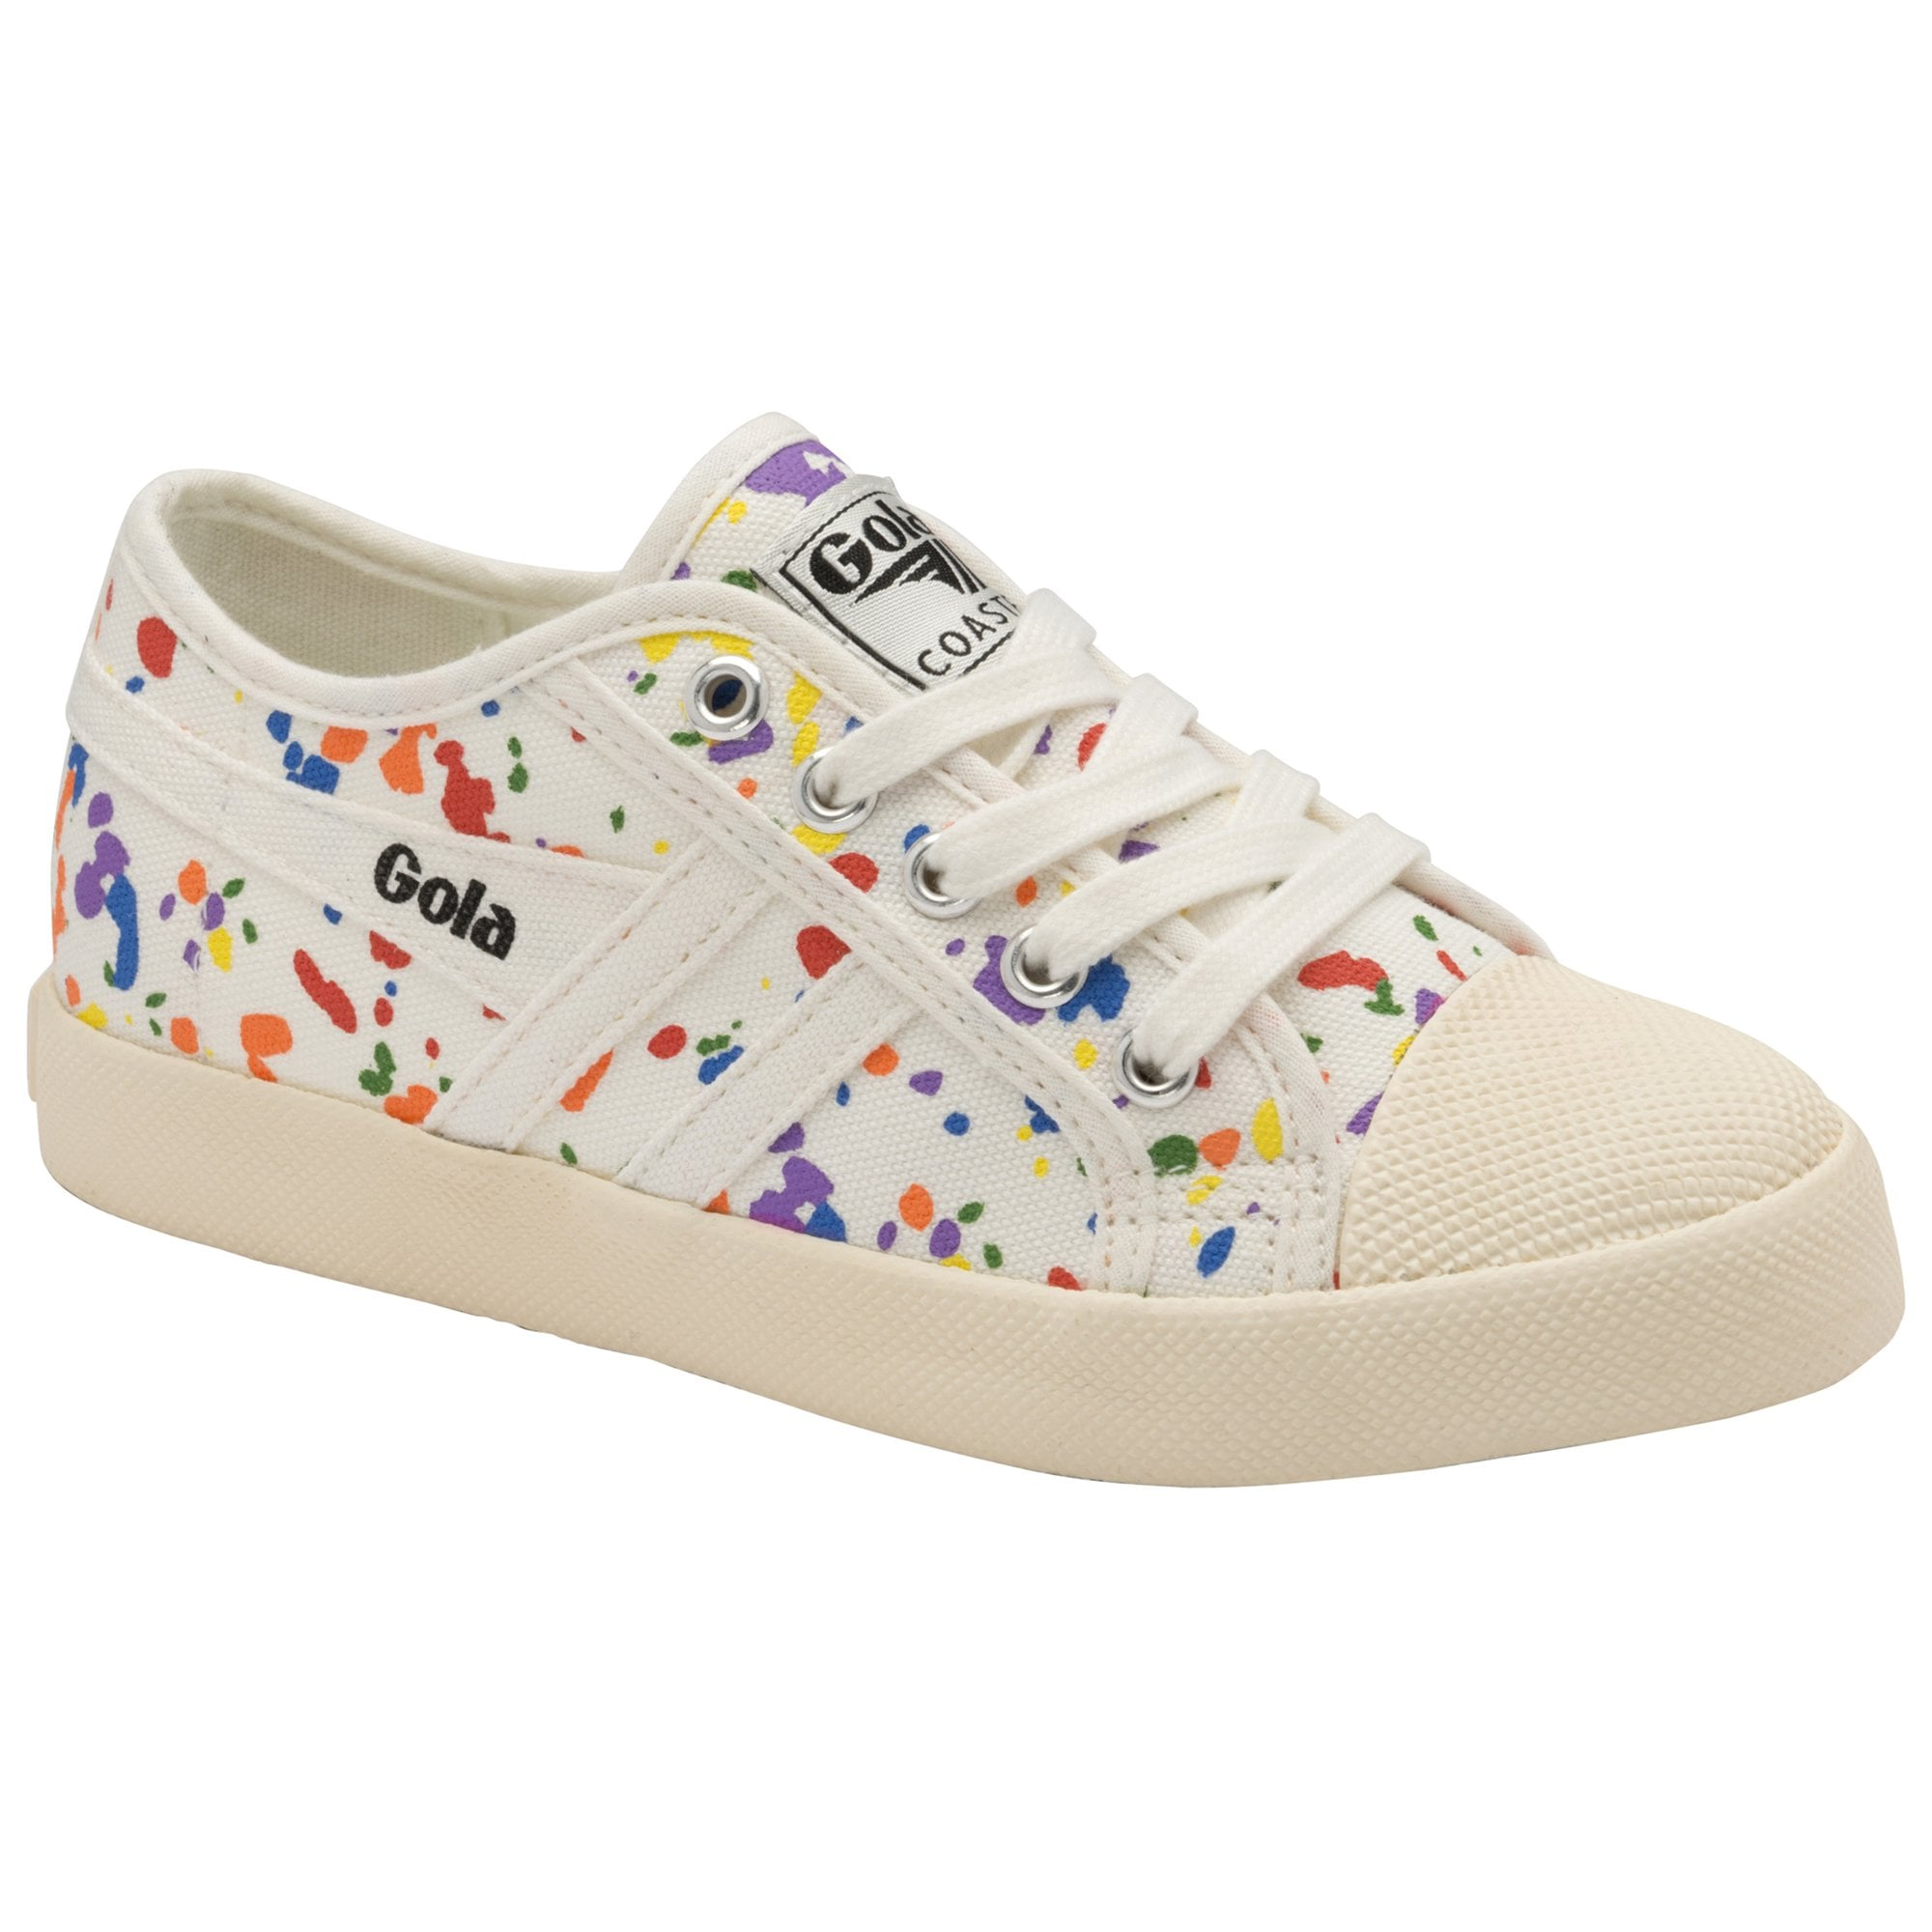 Buy Gola kids Coaster Splatter trainers